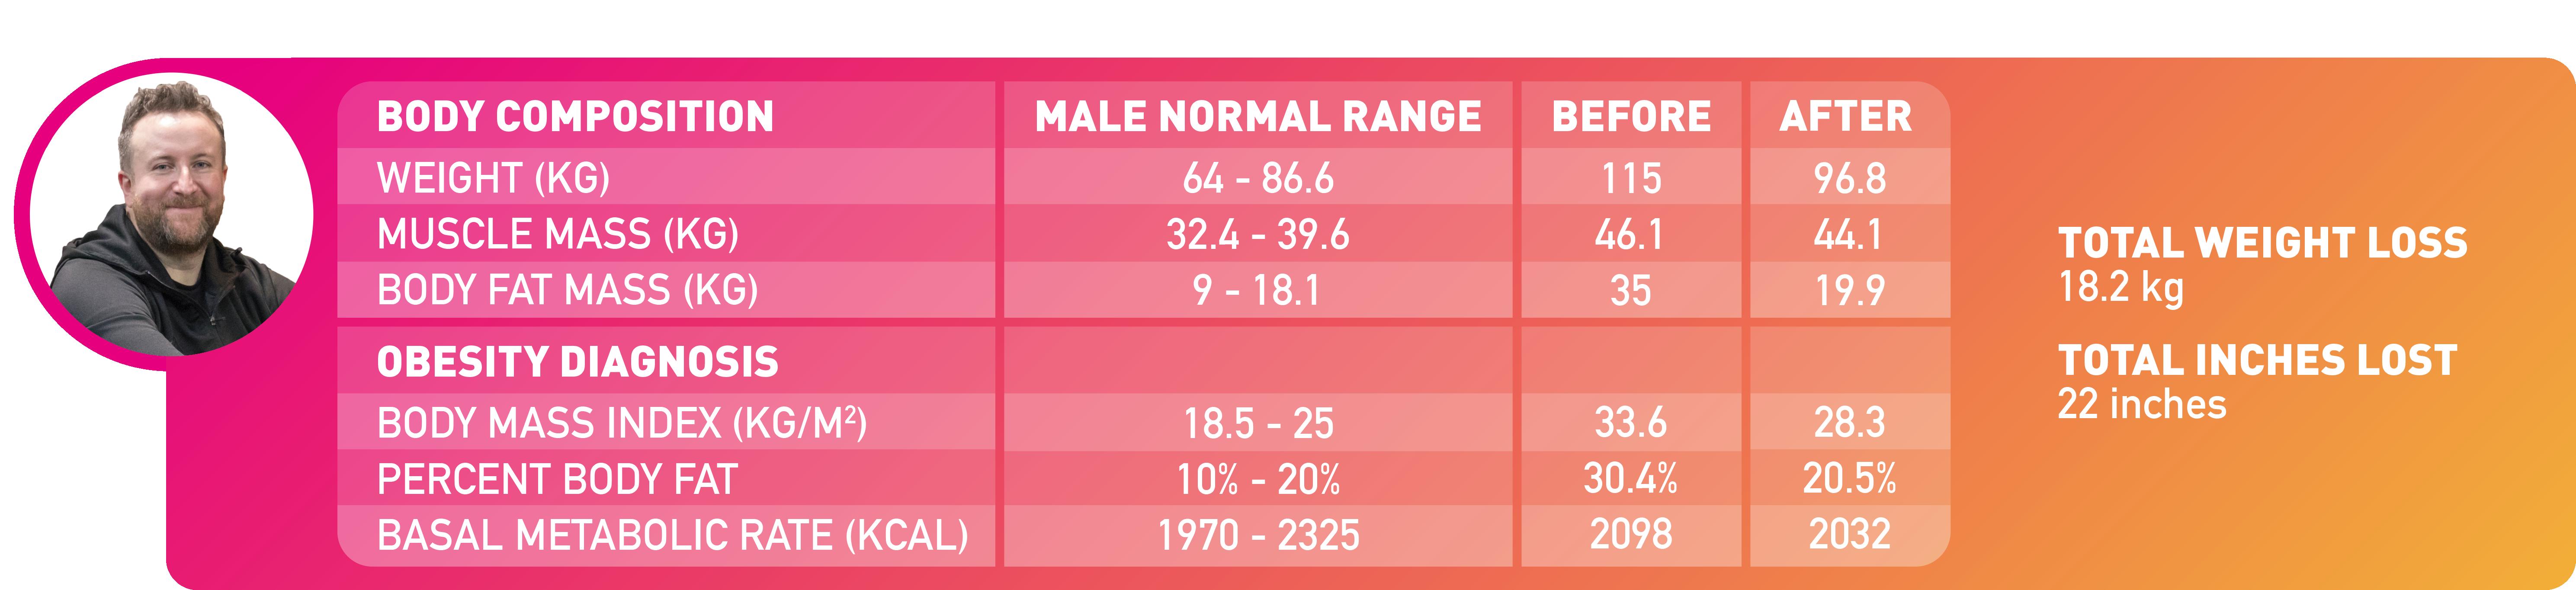 body transformation results simon